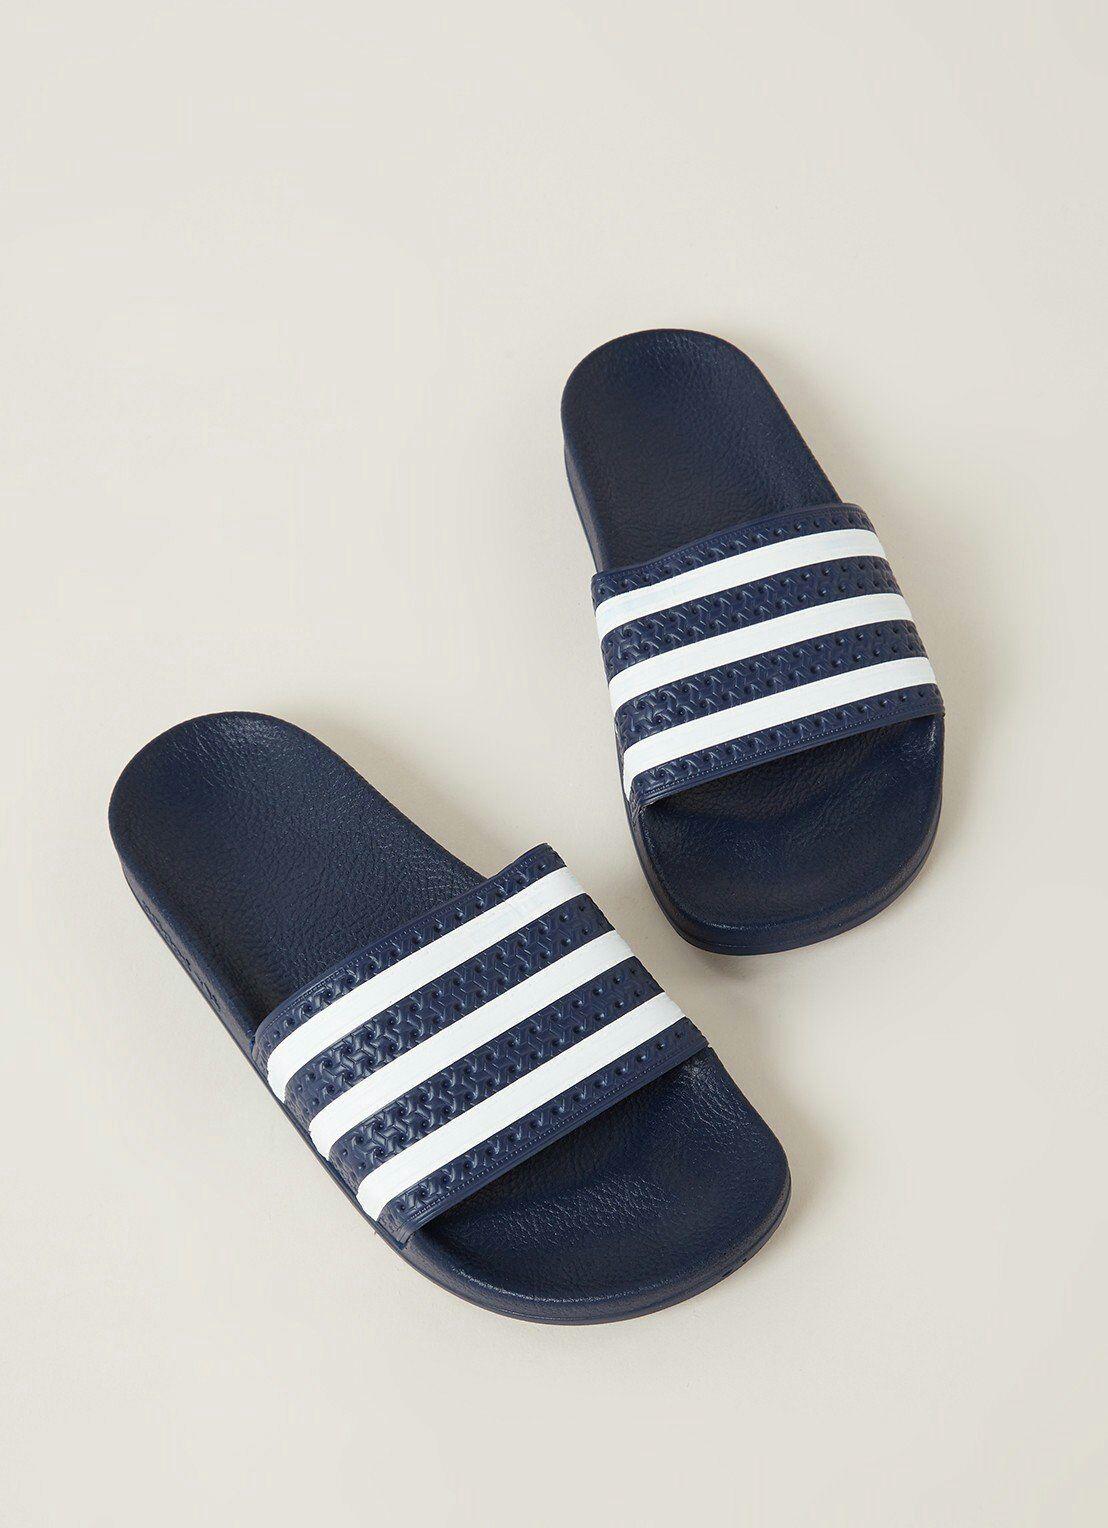 Adidas Adilette badslippers donkerblauw (maat 36) @Bijenkorf